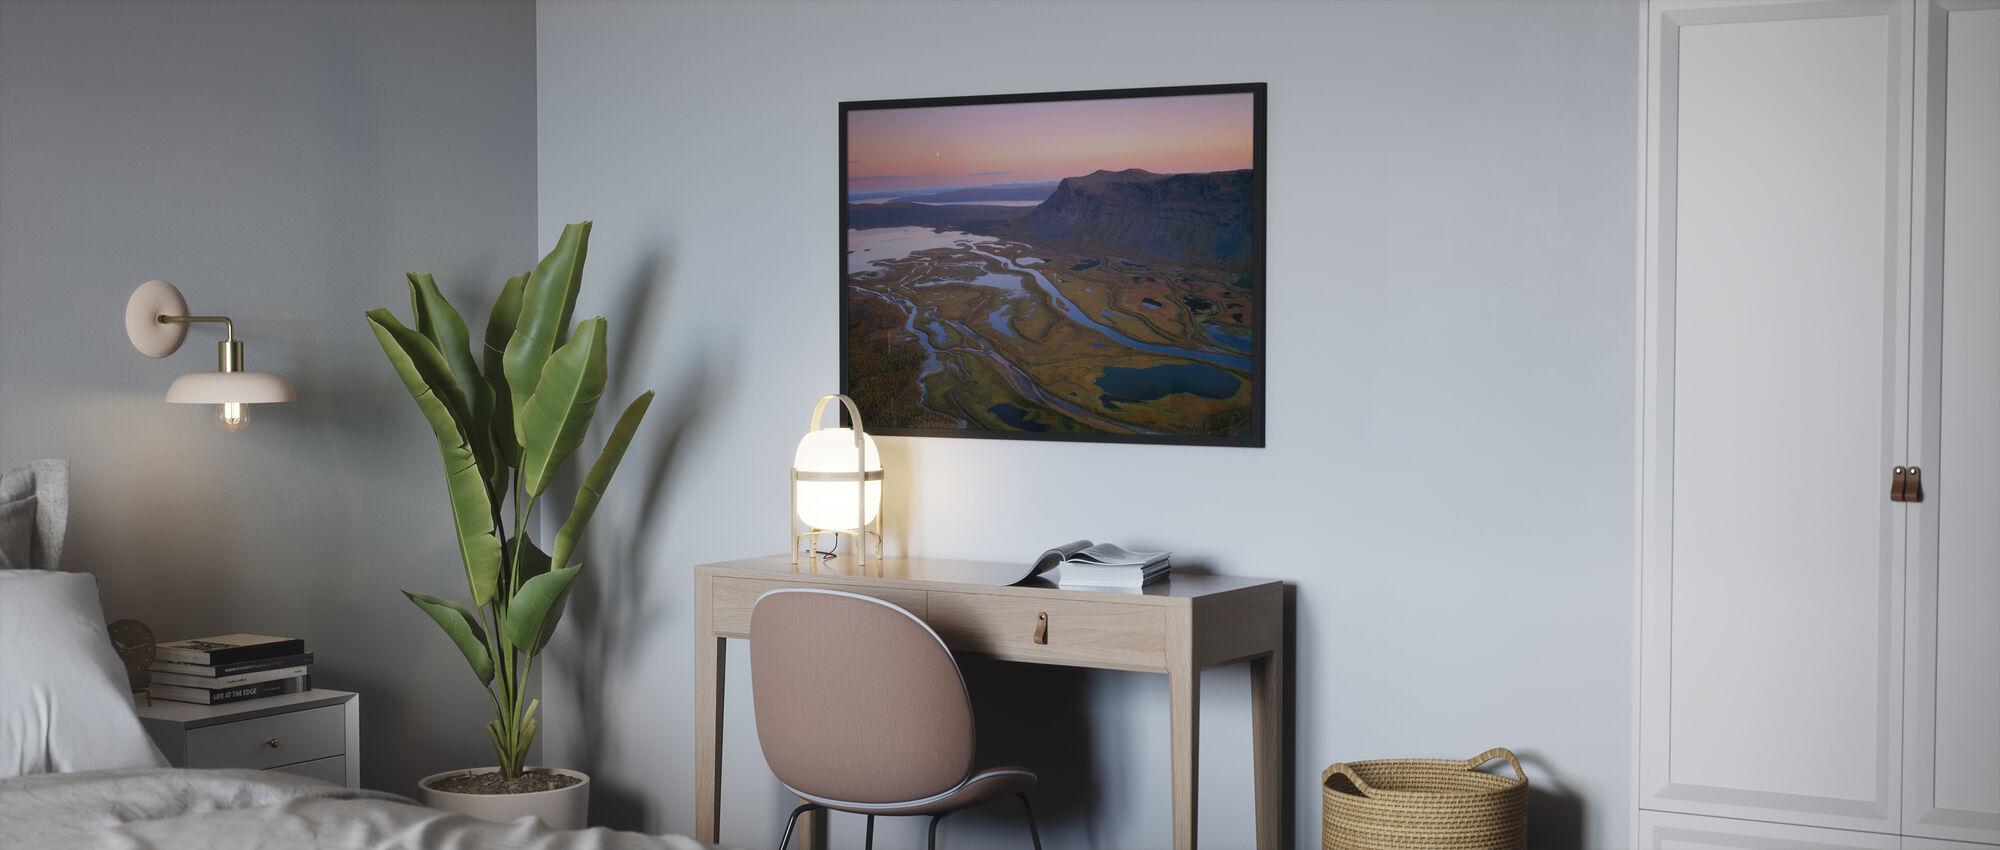 Enchanting Sarek - Poster - Bedroom